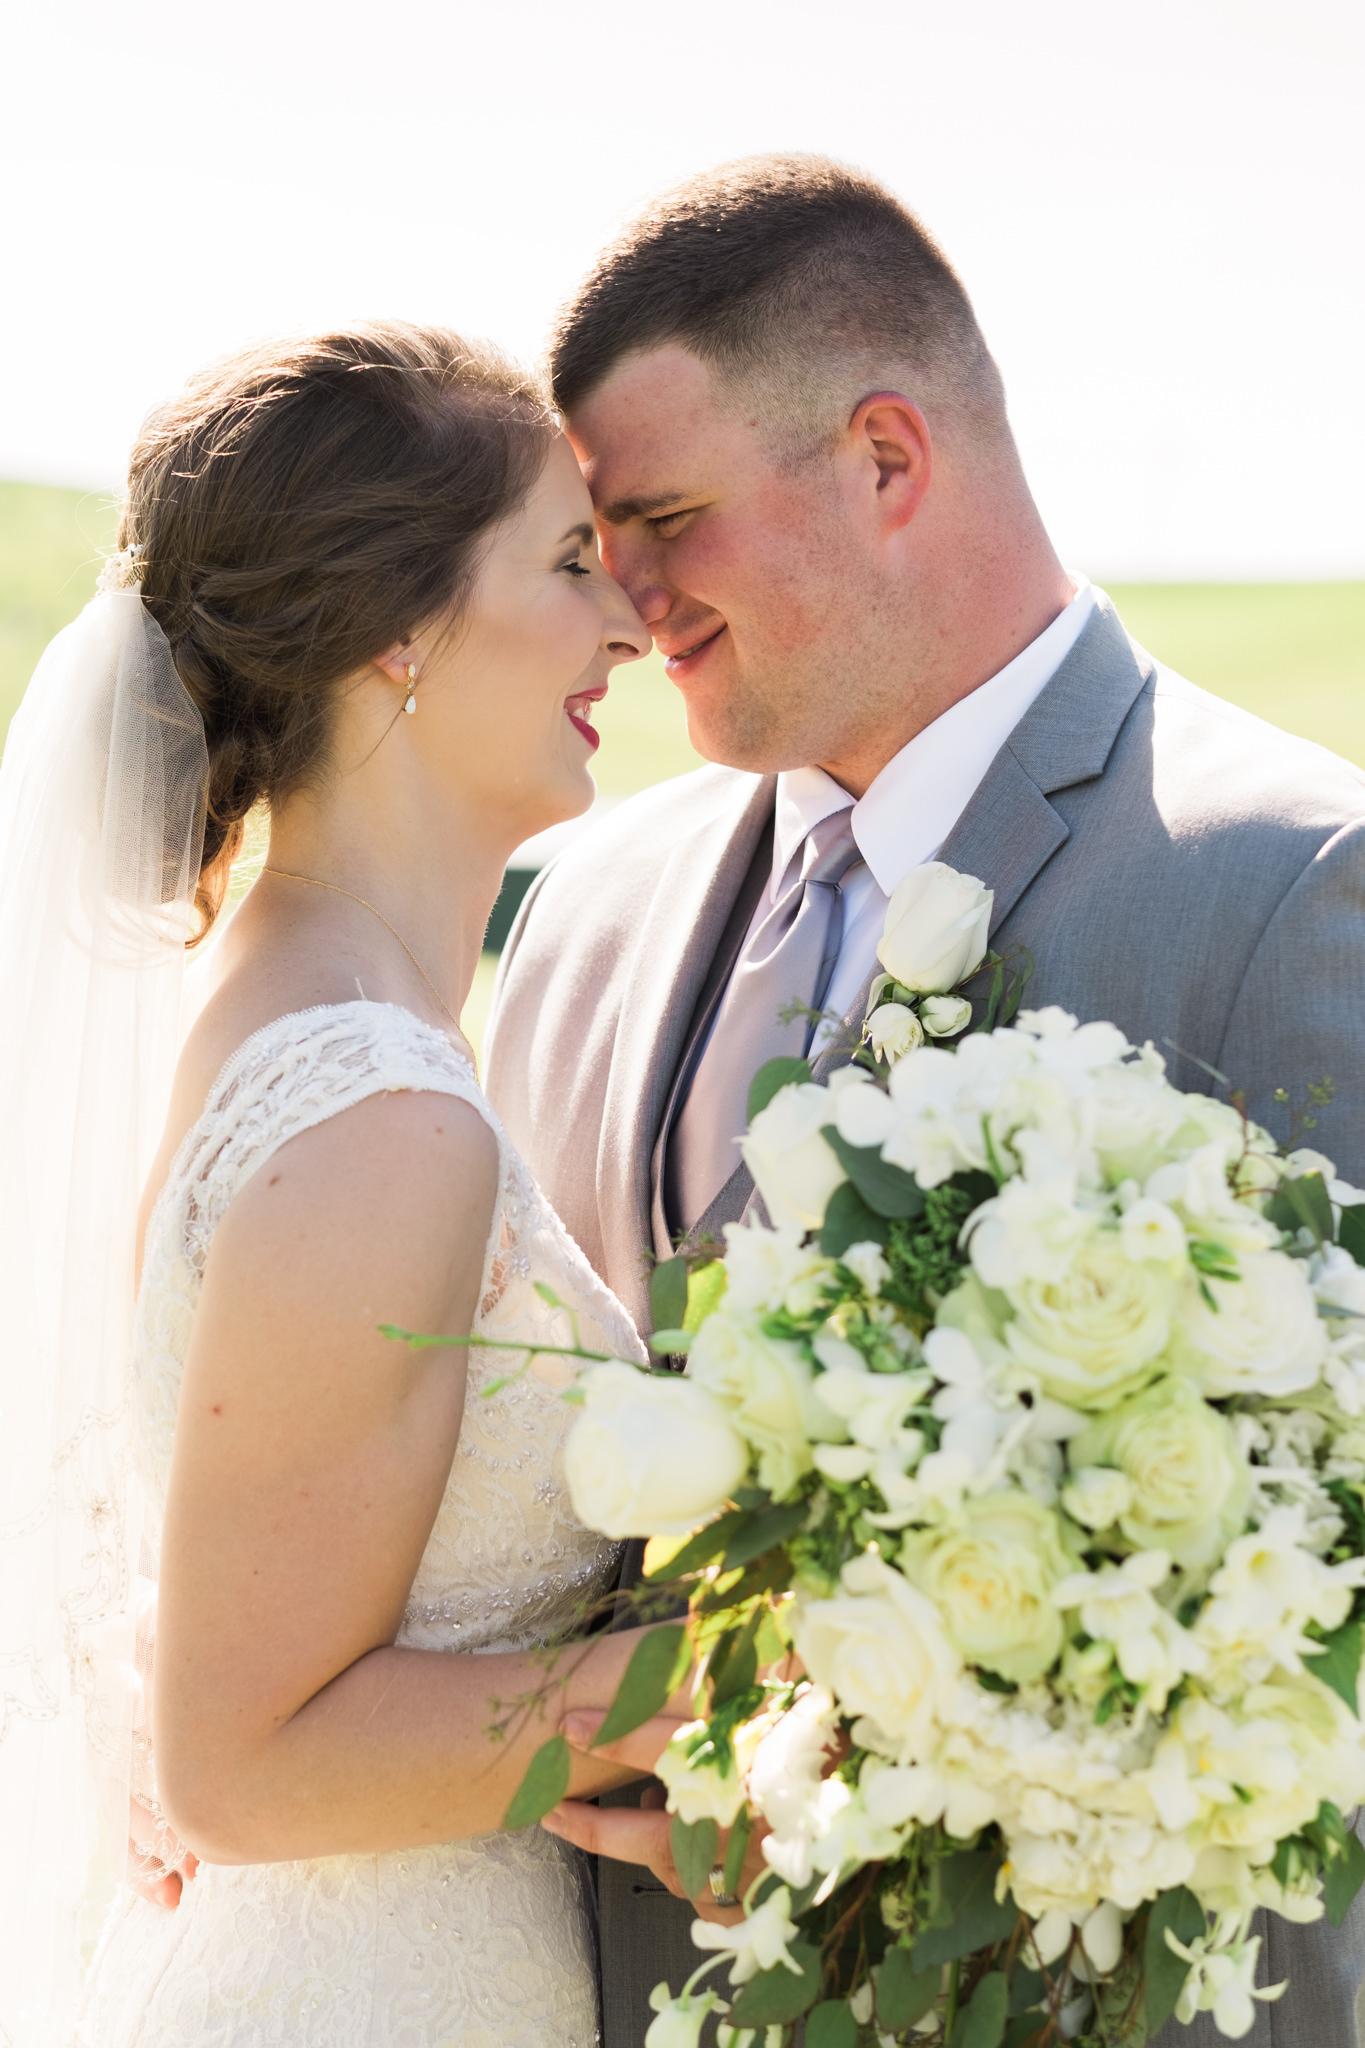 2017.06.03_Callie&Dustin_Wedding_Blog_0034.jpg